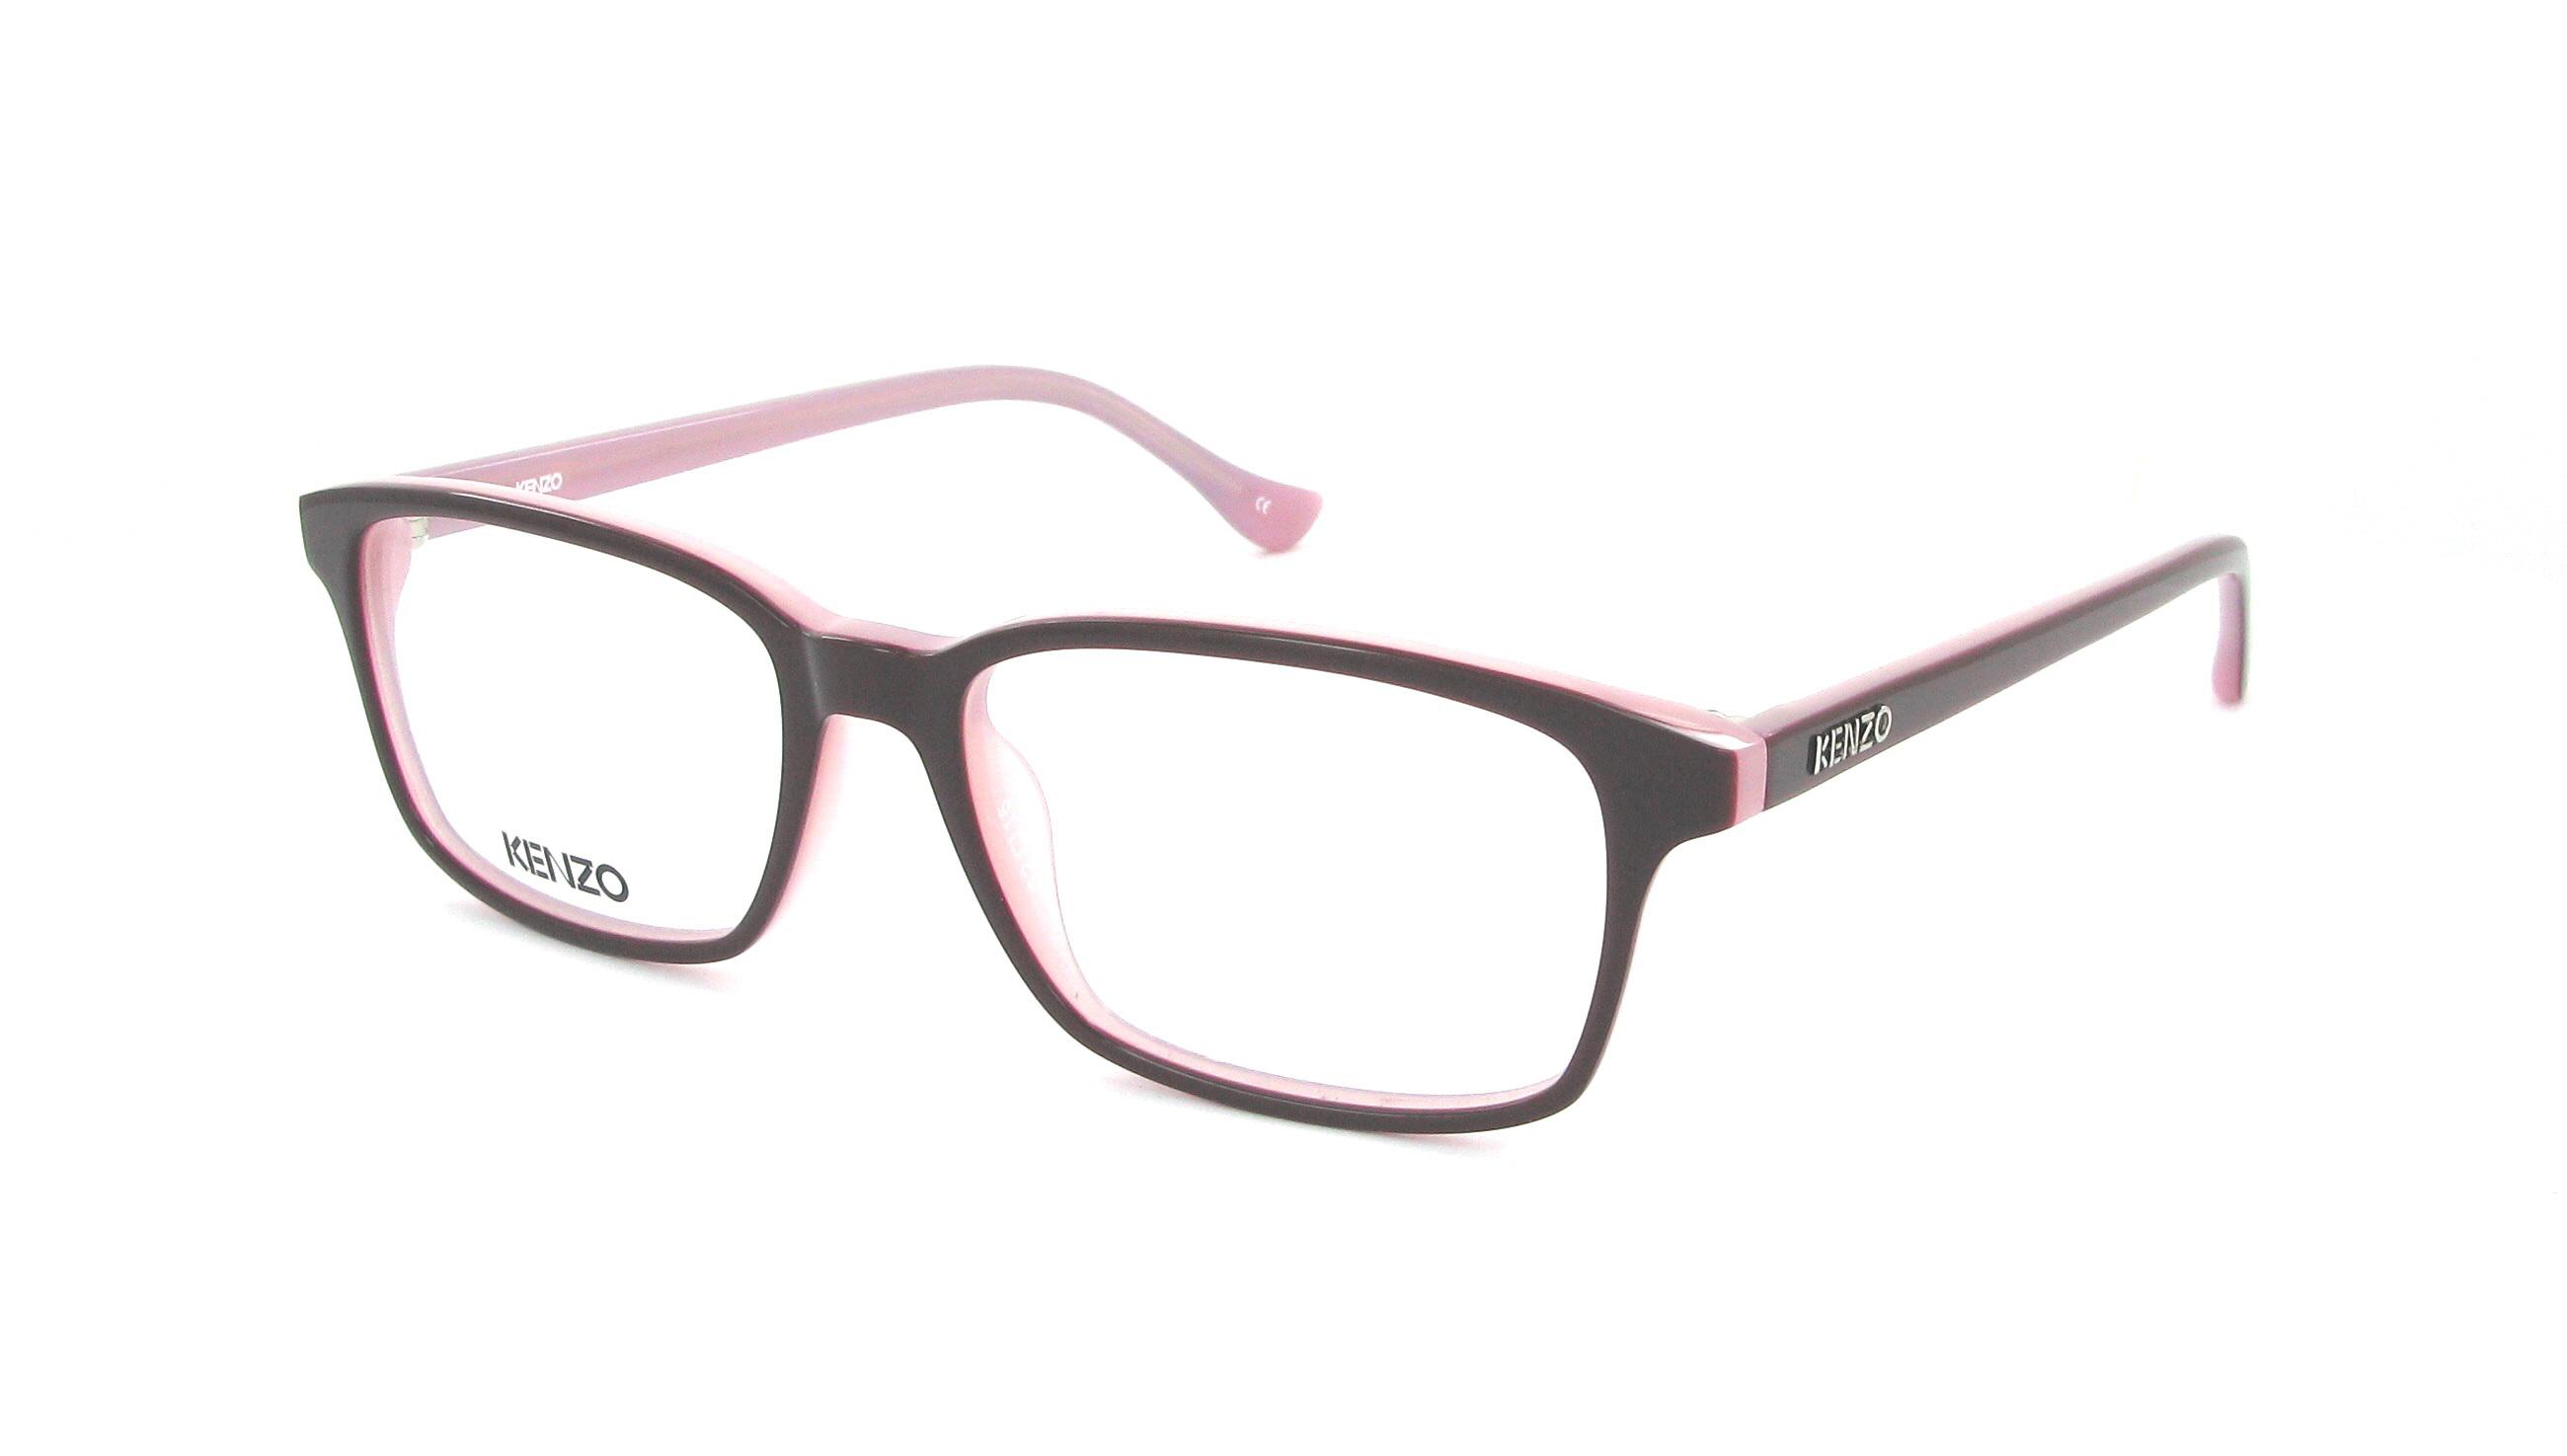 monture lunette kenzo femme monture lunette kenzo femme sur enperdresonlapin. Black Bedroom Furniture Sets. Home Design Ideas